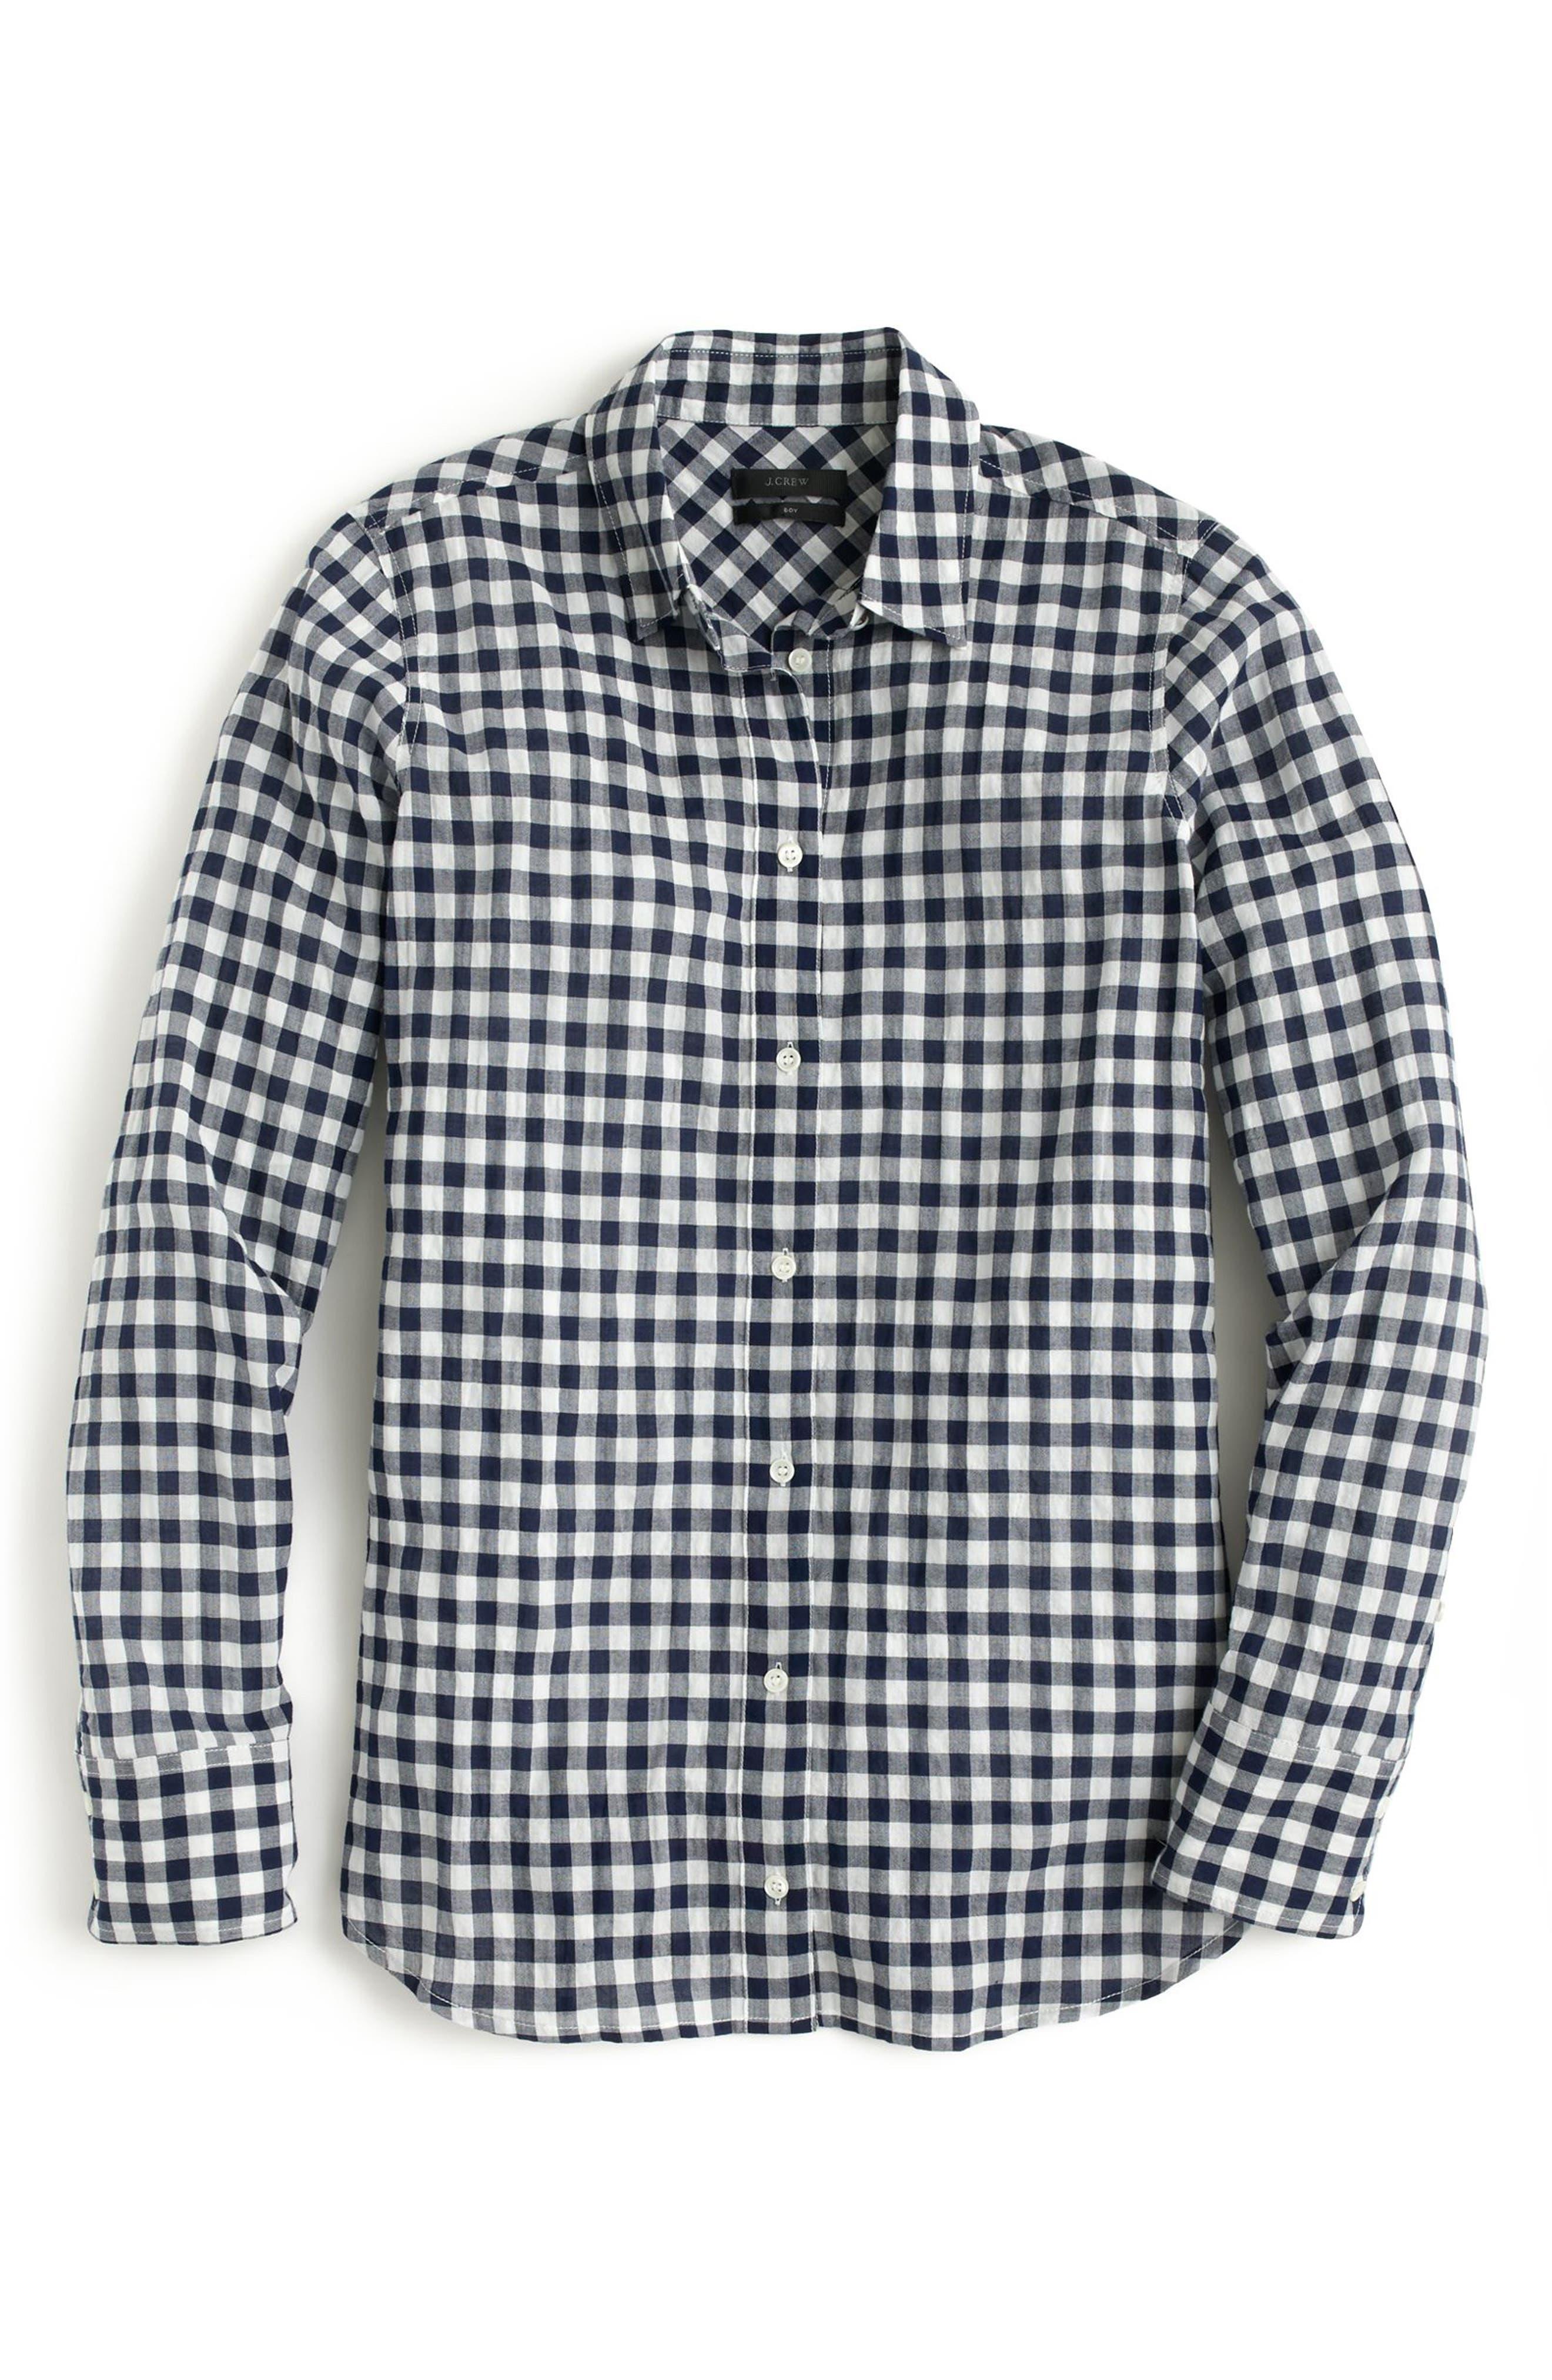 Alternate Image 4  - J.Crew Crinkle Gingham Boy Shirt (Regular & Petite)